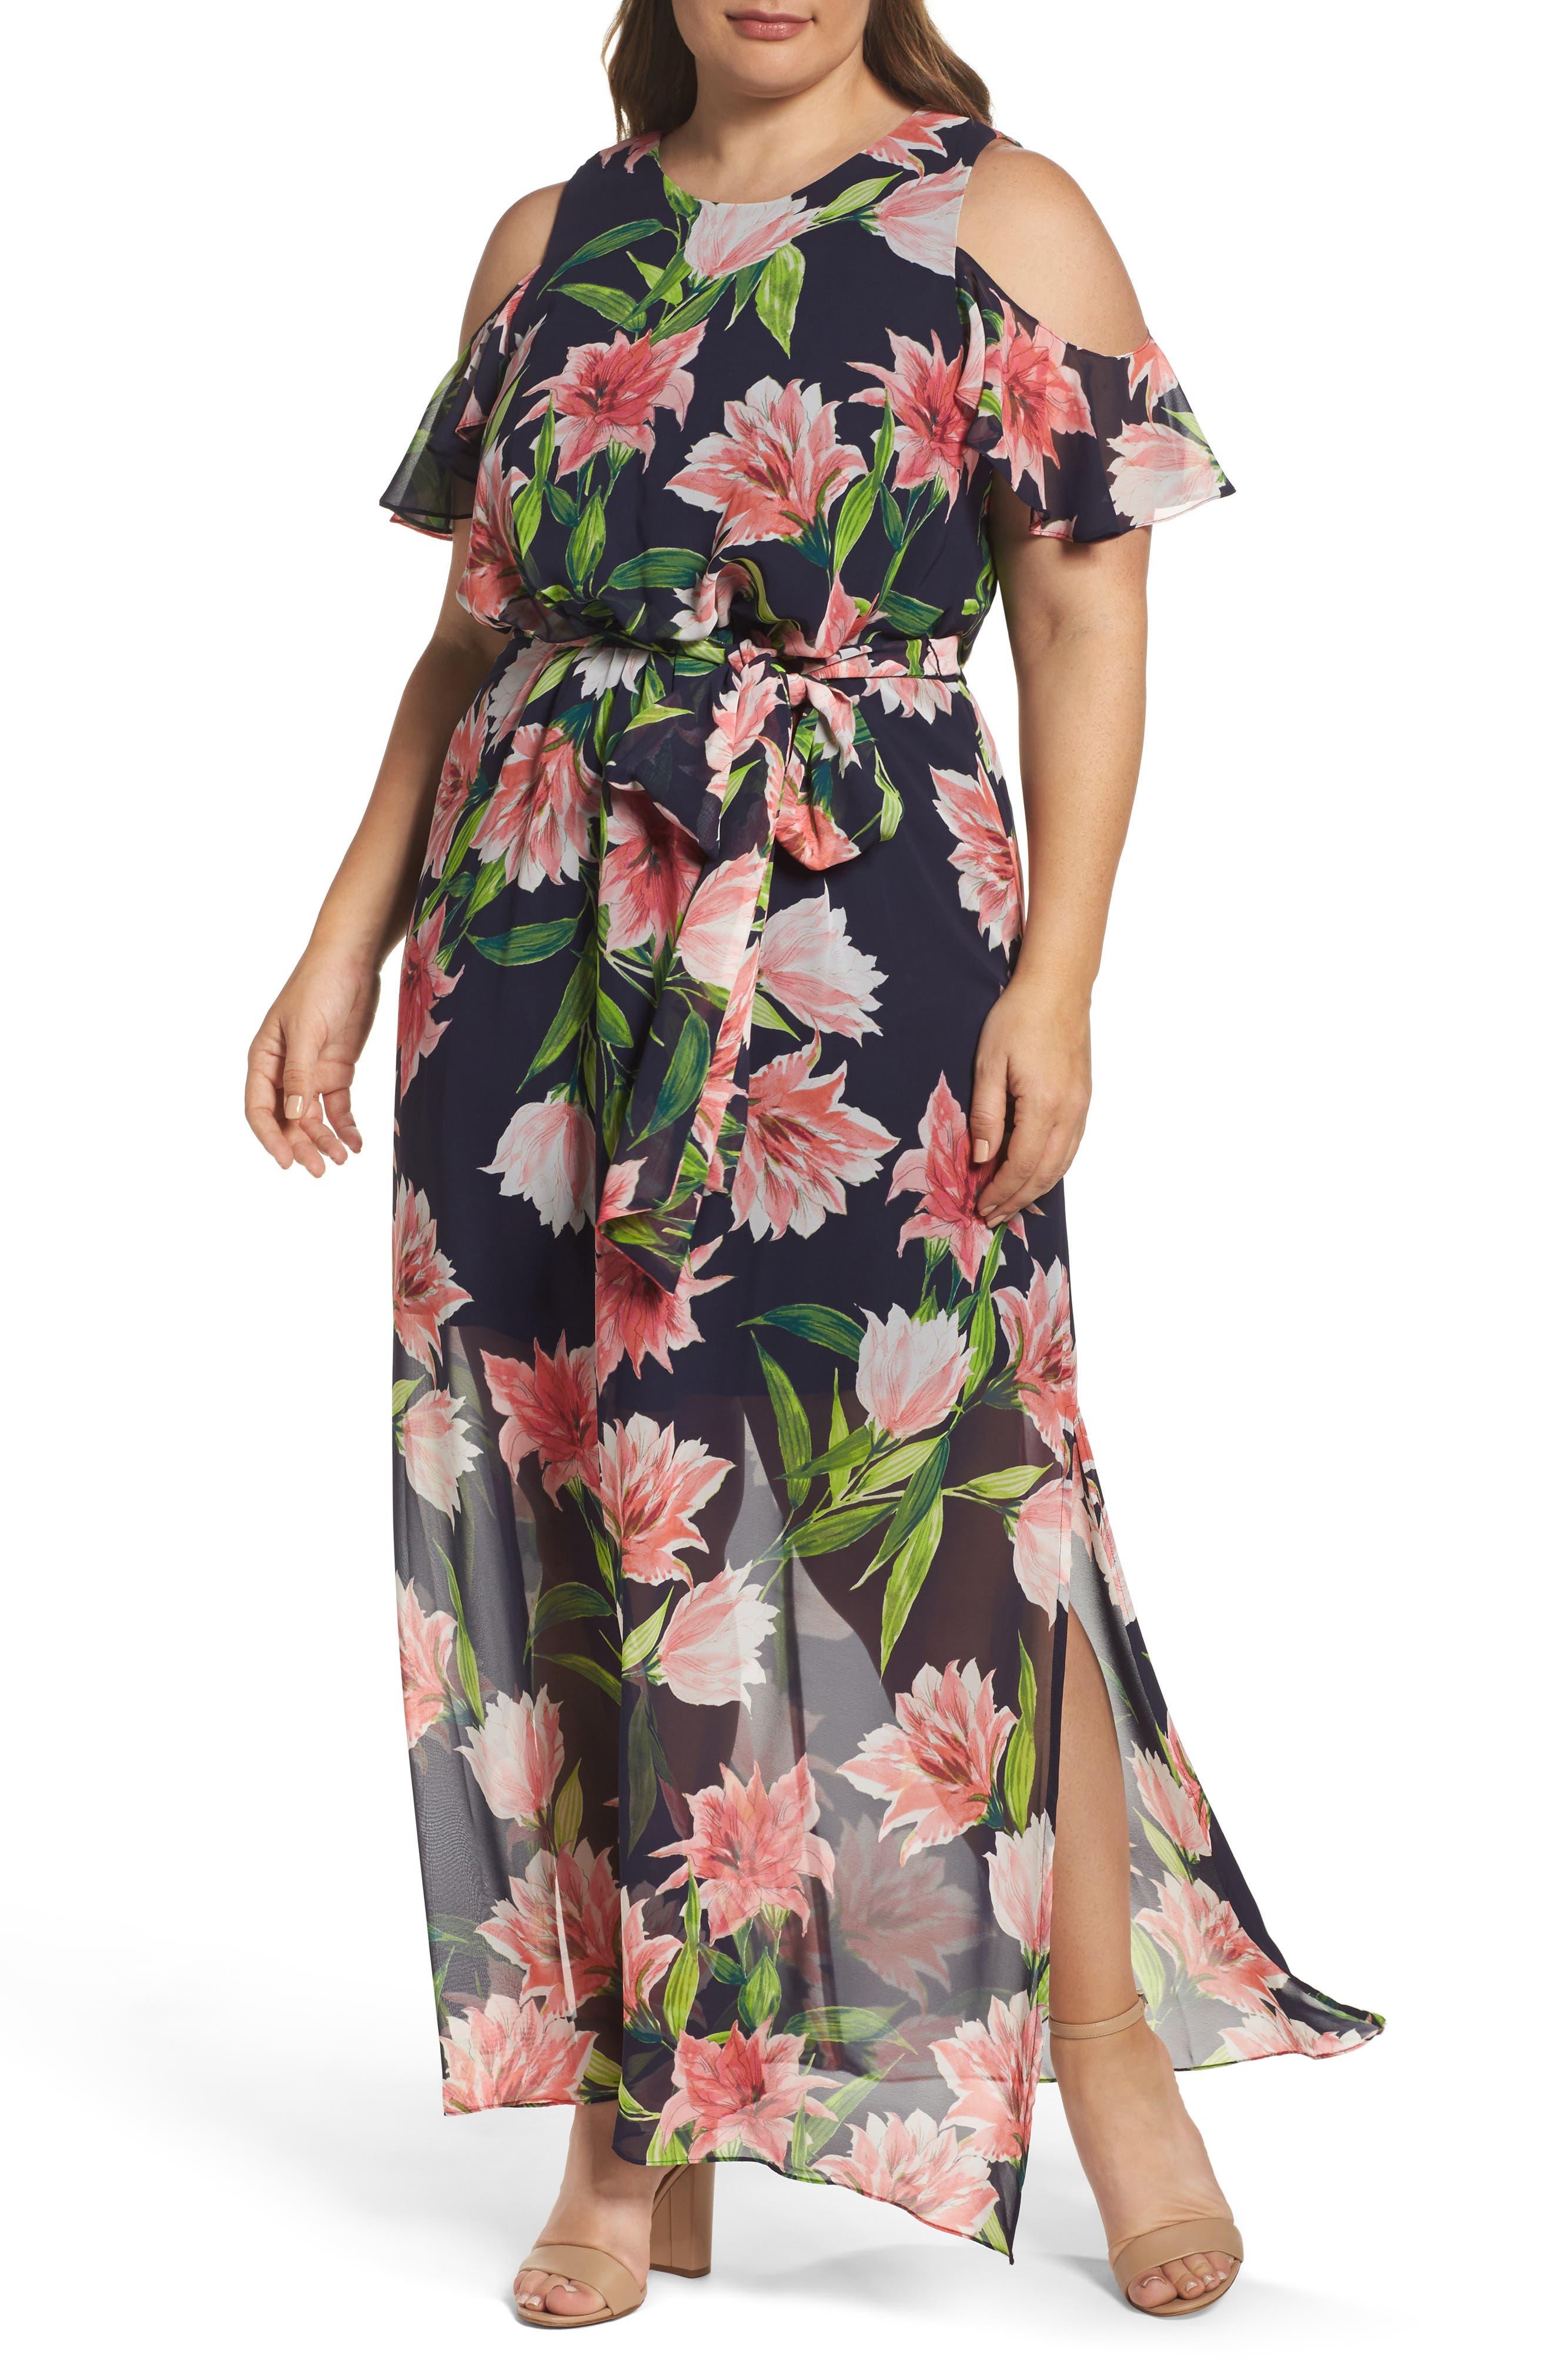 Alternate Image 1 Selected - Eliza J Floral Chiffon Cold Shoulder Maxi Dress (Plus Size)